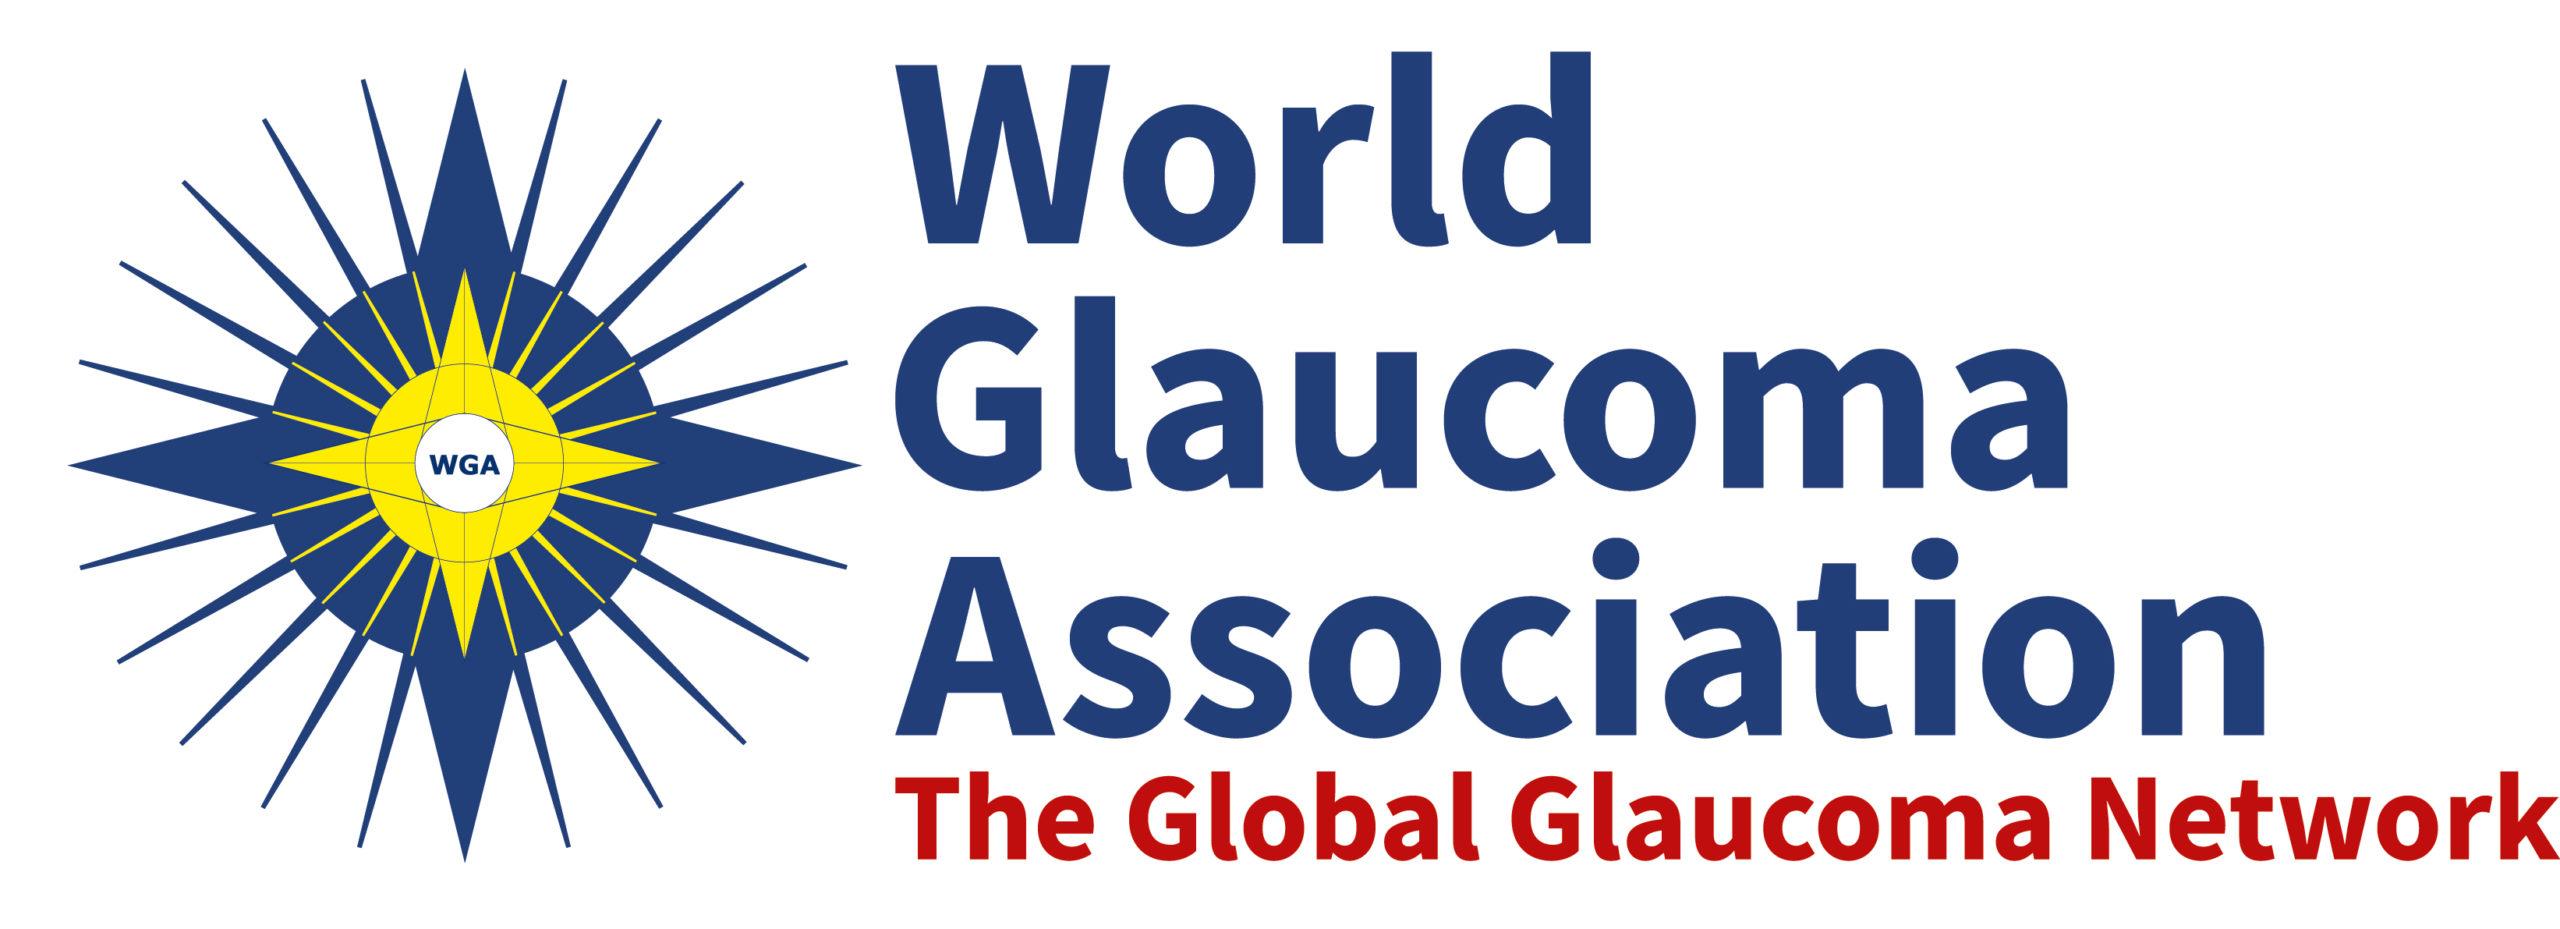 World Glaucoma Association (WGA)